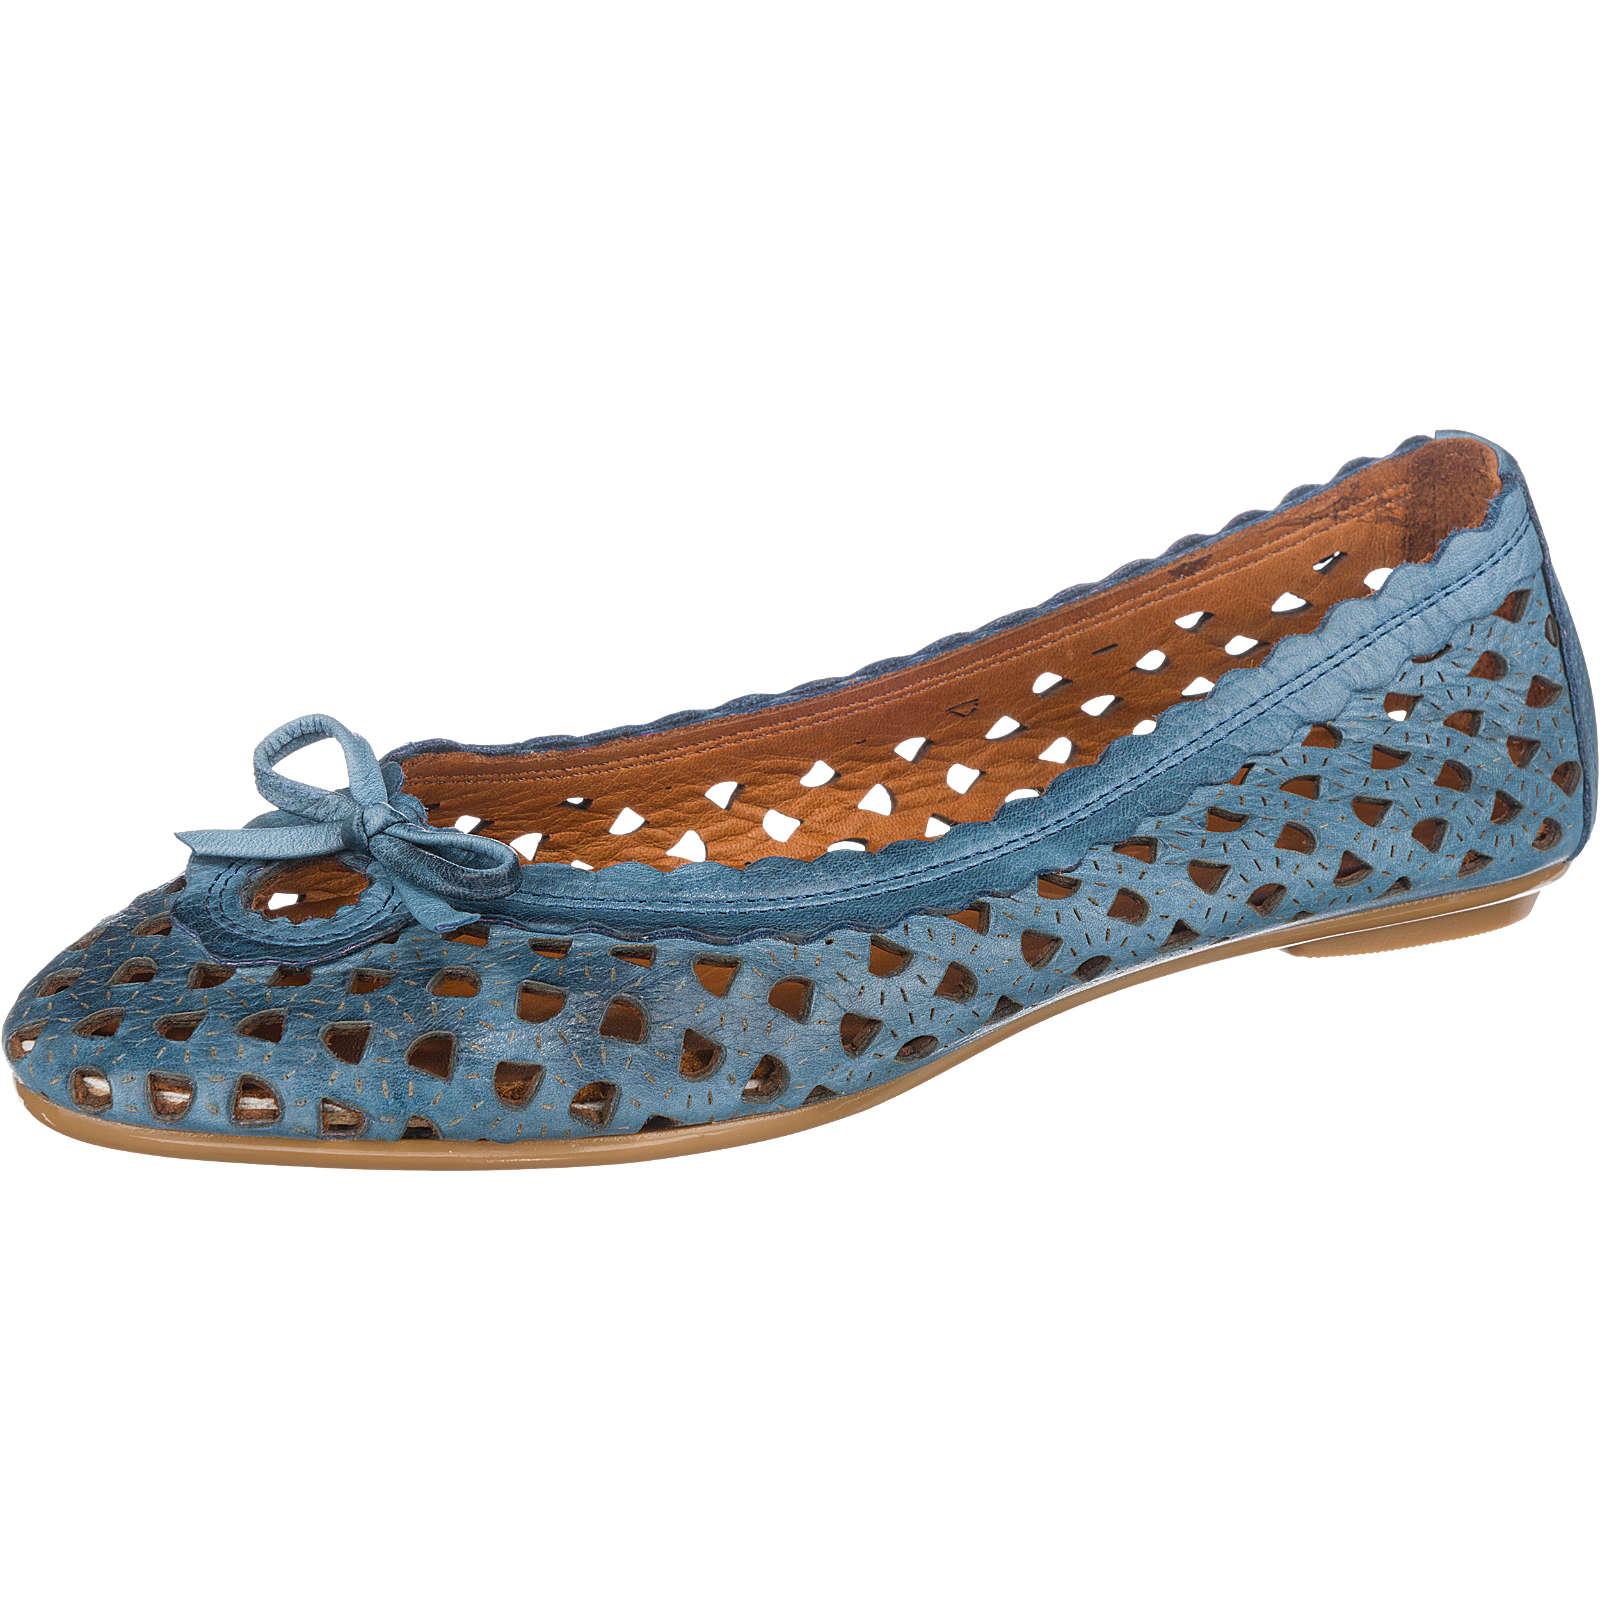 Andrea Conti Ballerinas blau Damen Gr. 39 jetztbilligerkaufen